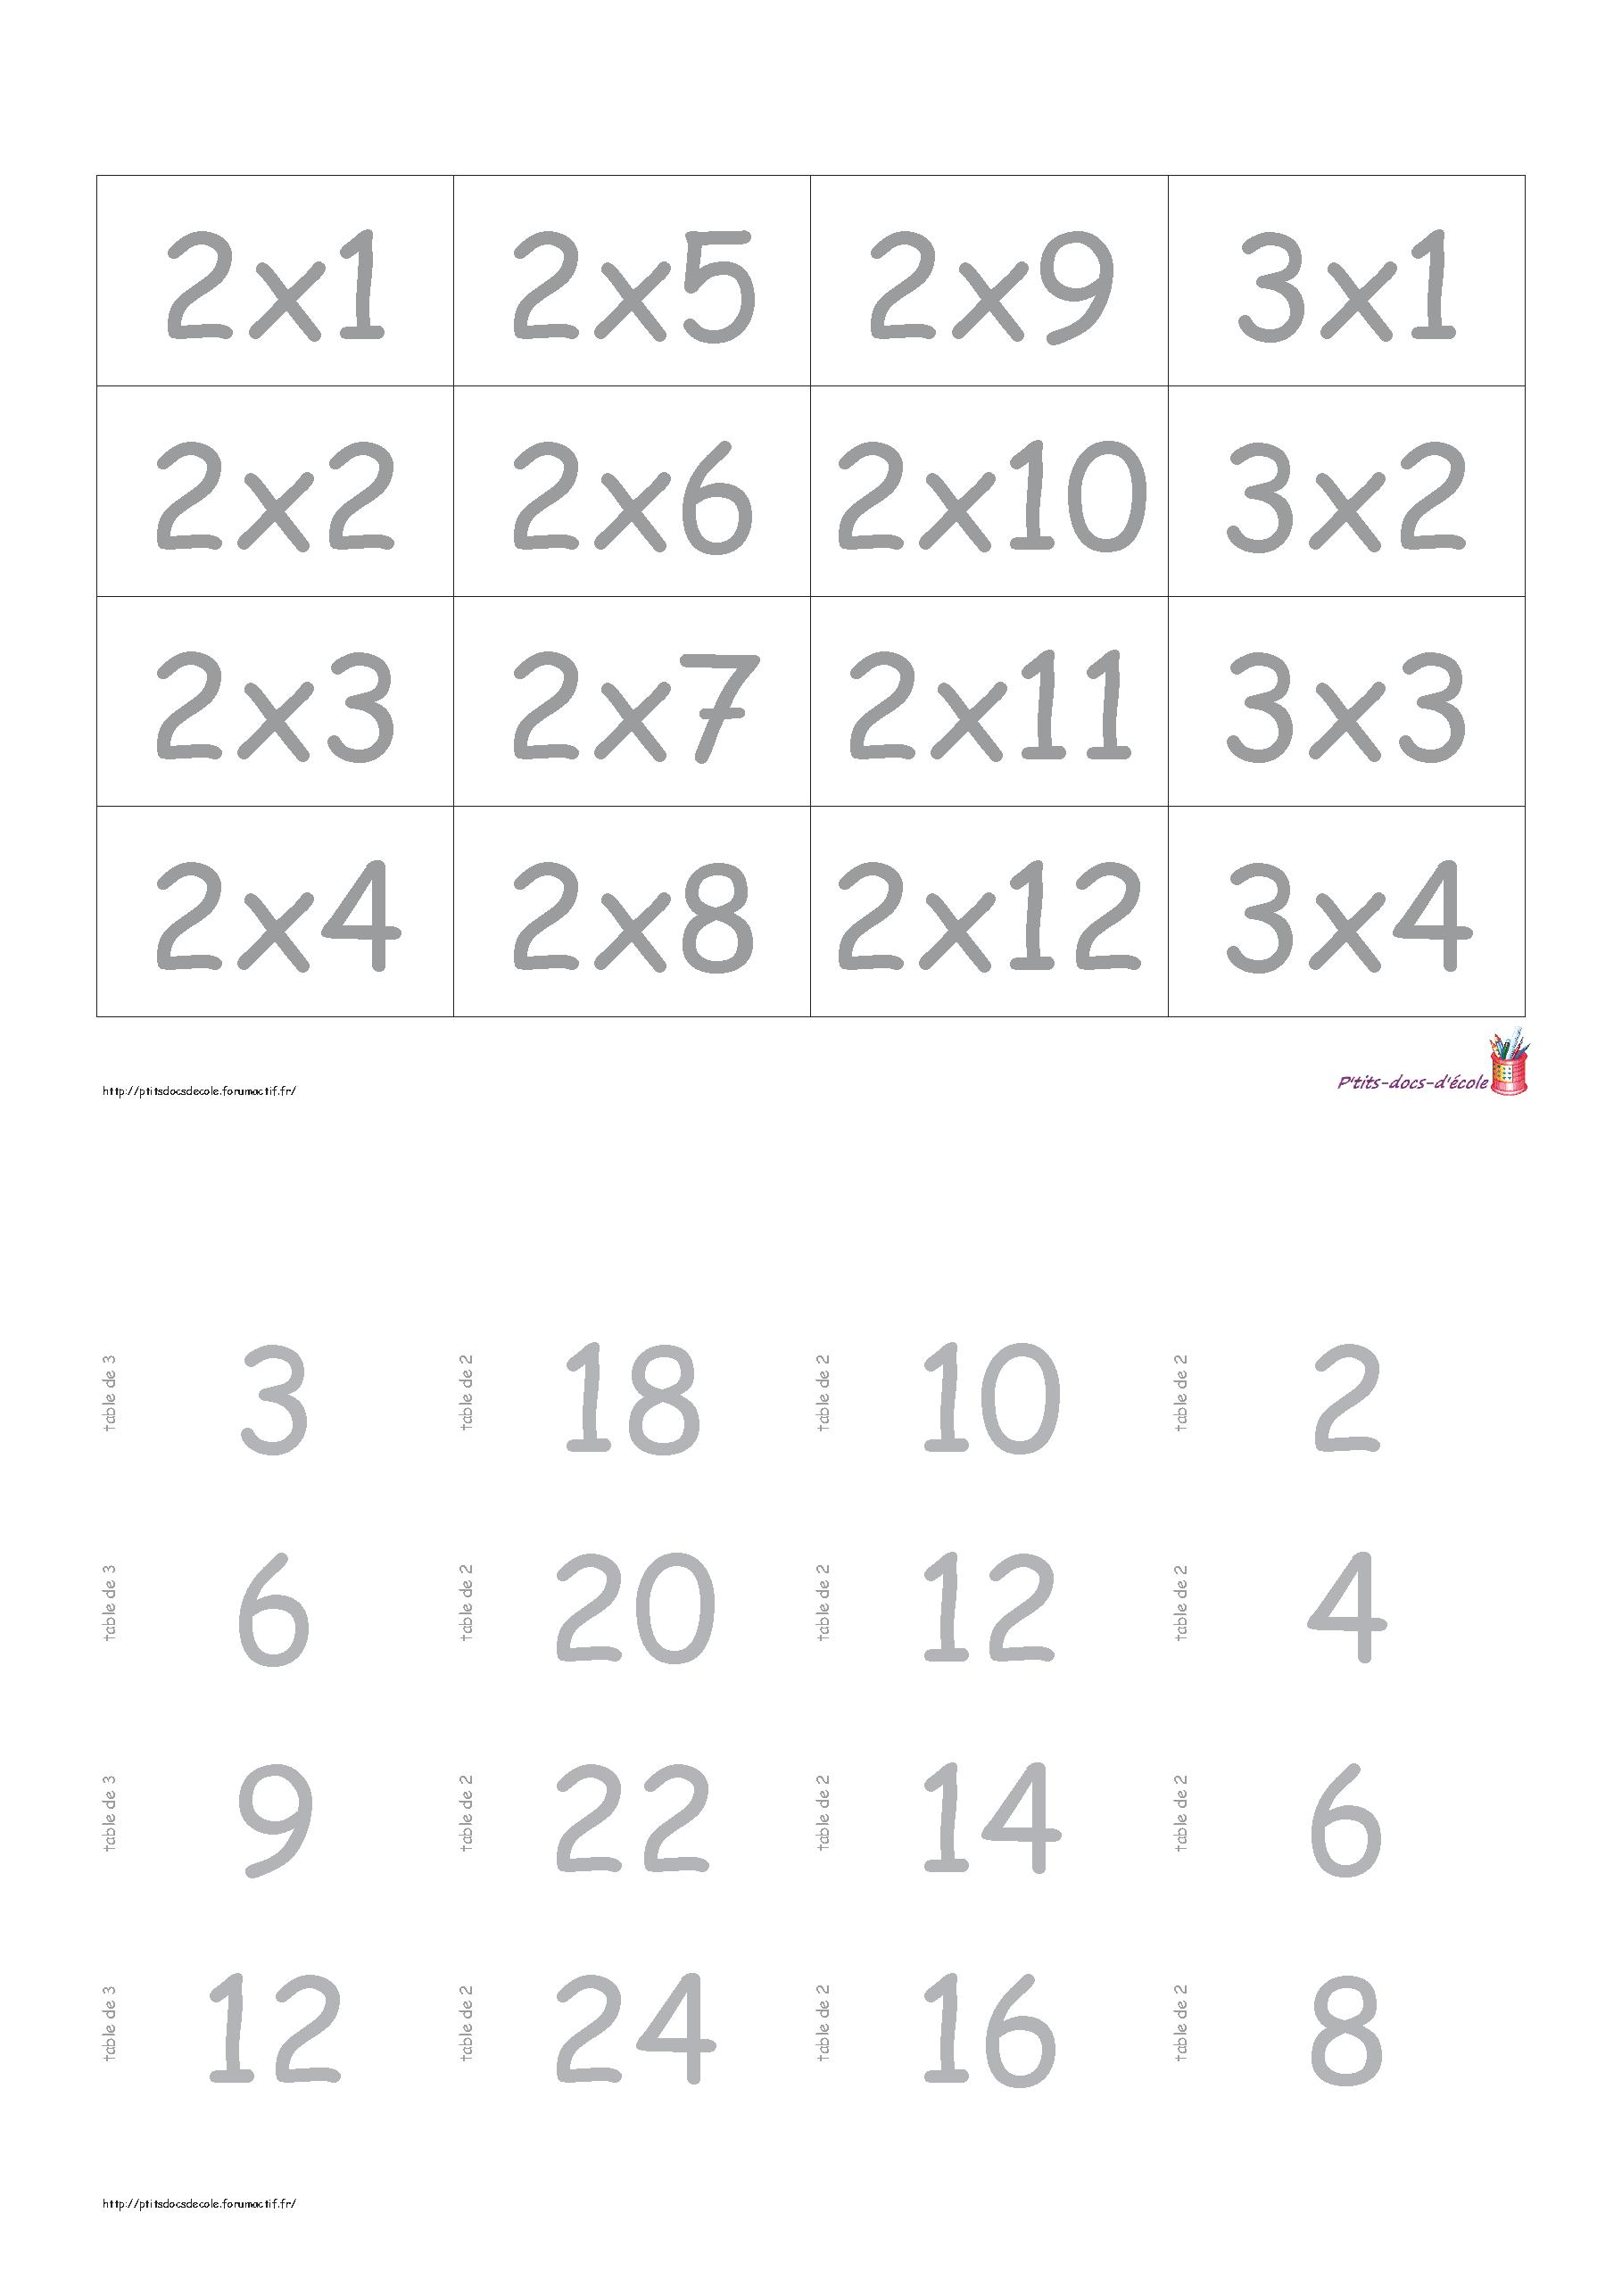 Un petit jeu de cartes imprimer recto verso pour - Reviser les tables de multiplications ...